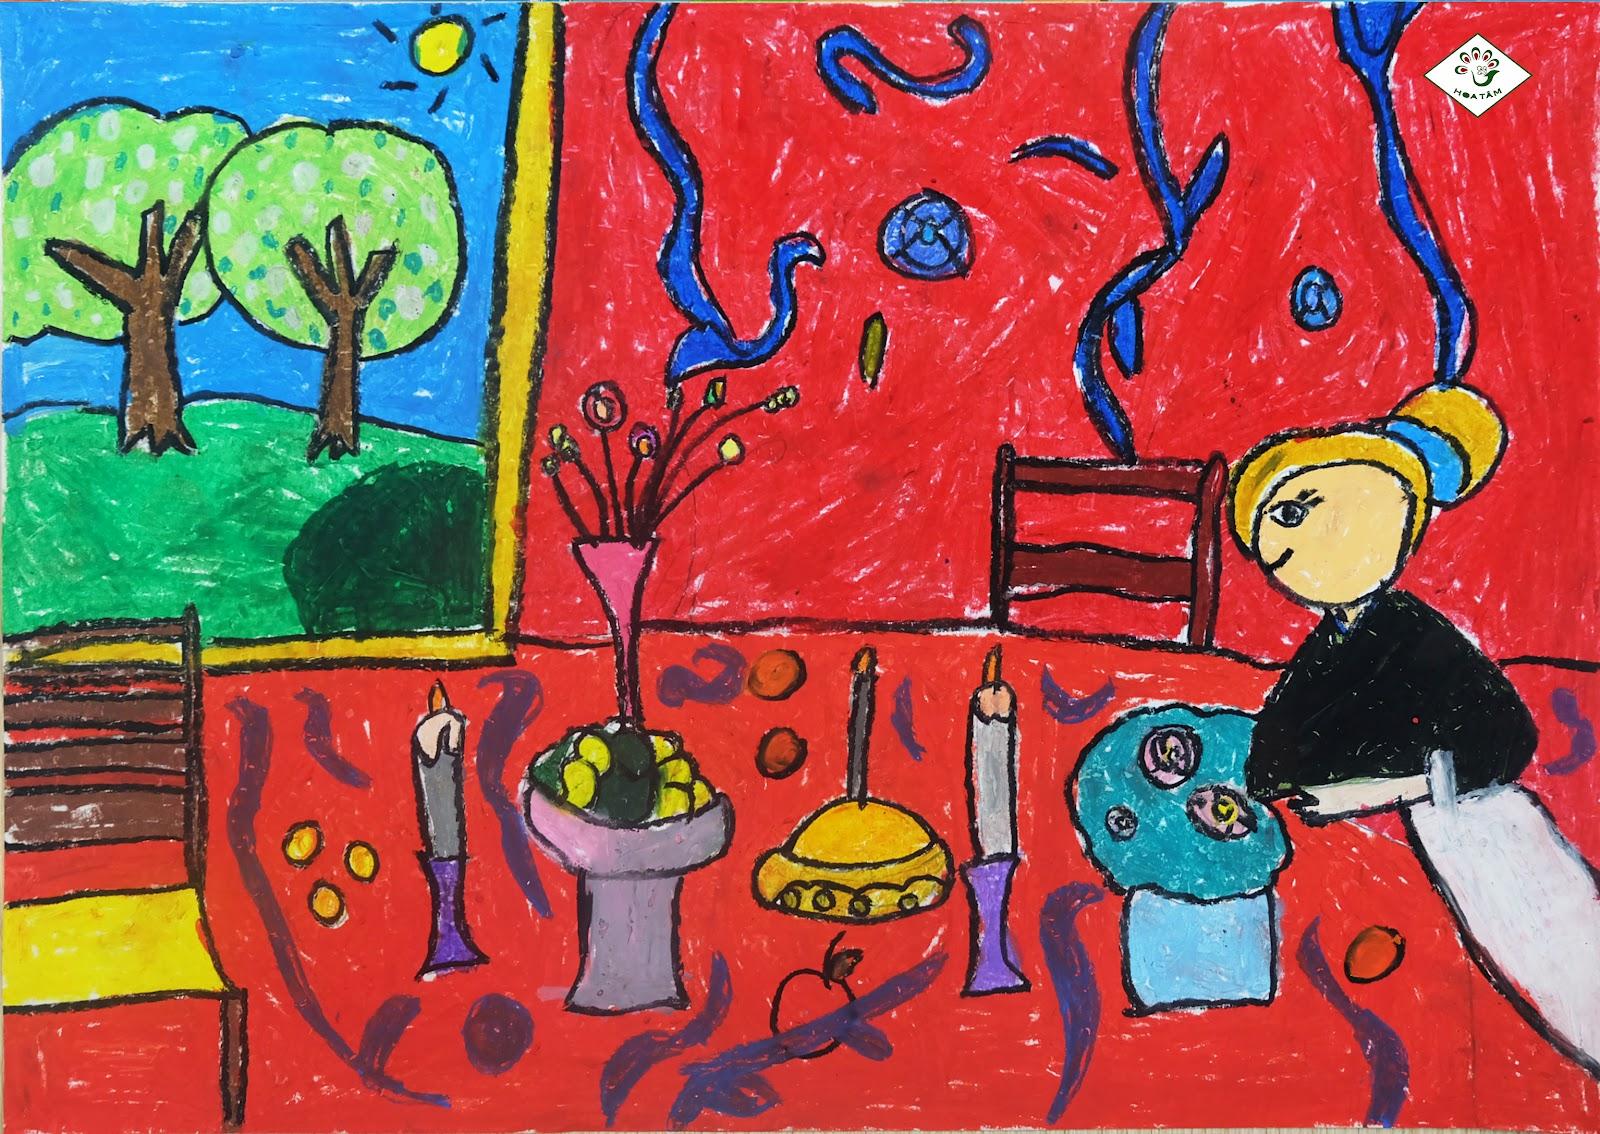 Be-mo-phong-tranh-cua-danh-hoa-Henri-Matisse-3